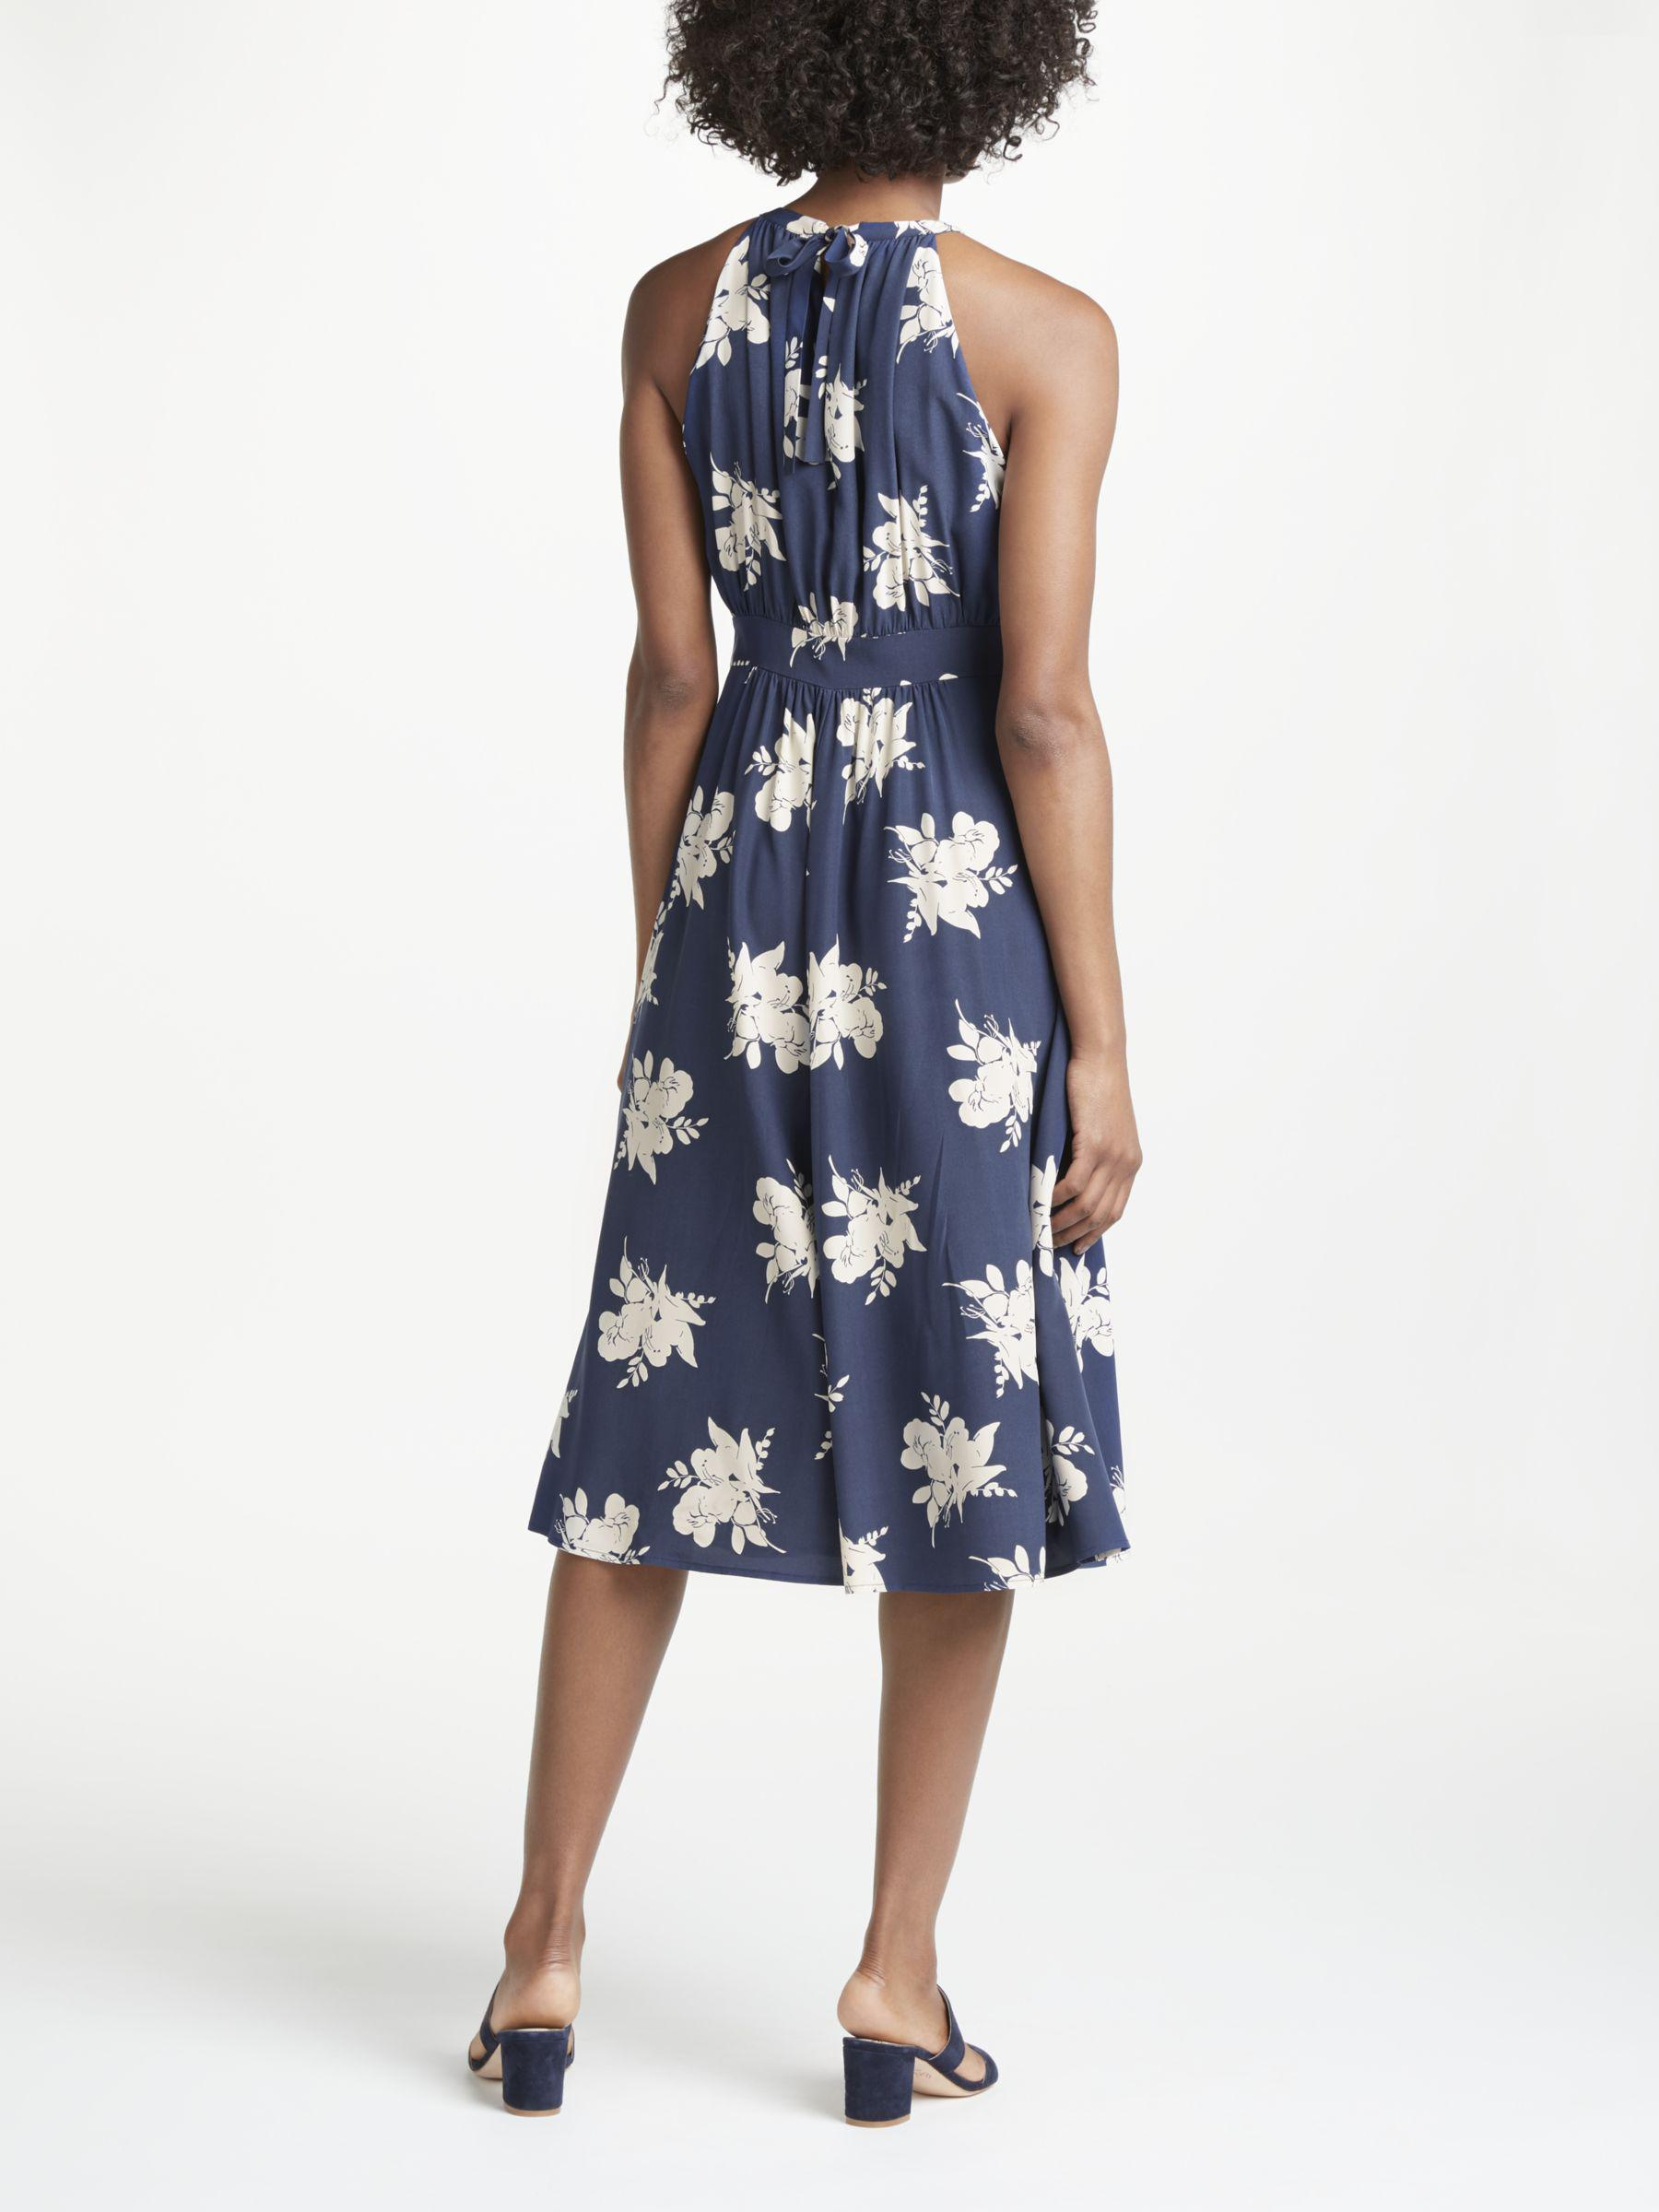 469bb8bbb50d Boden Agnes Halterneck Floral Print Midi Dress in Blue - Lyst